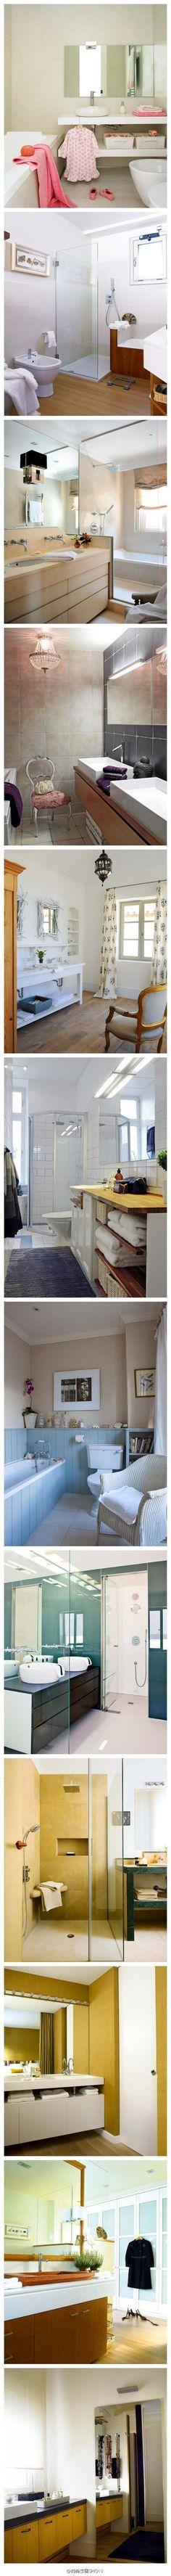 Crazy wallpaper houses pinterest